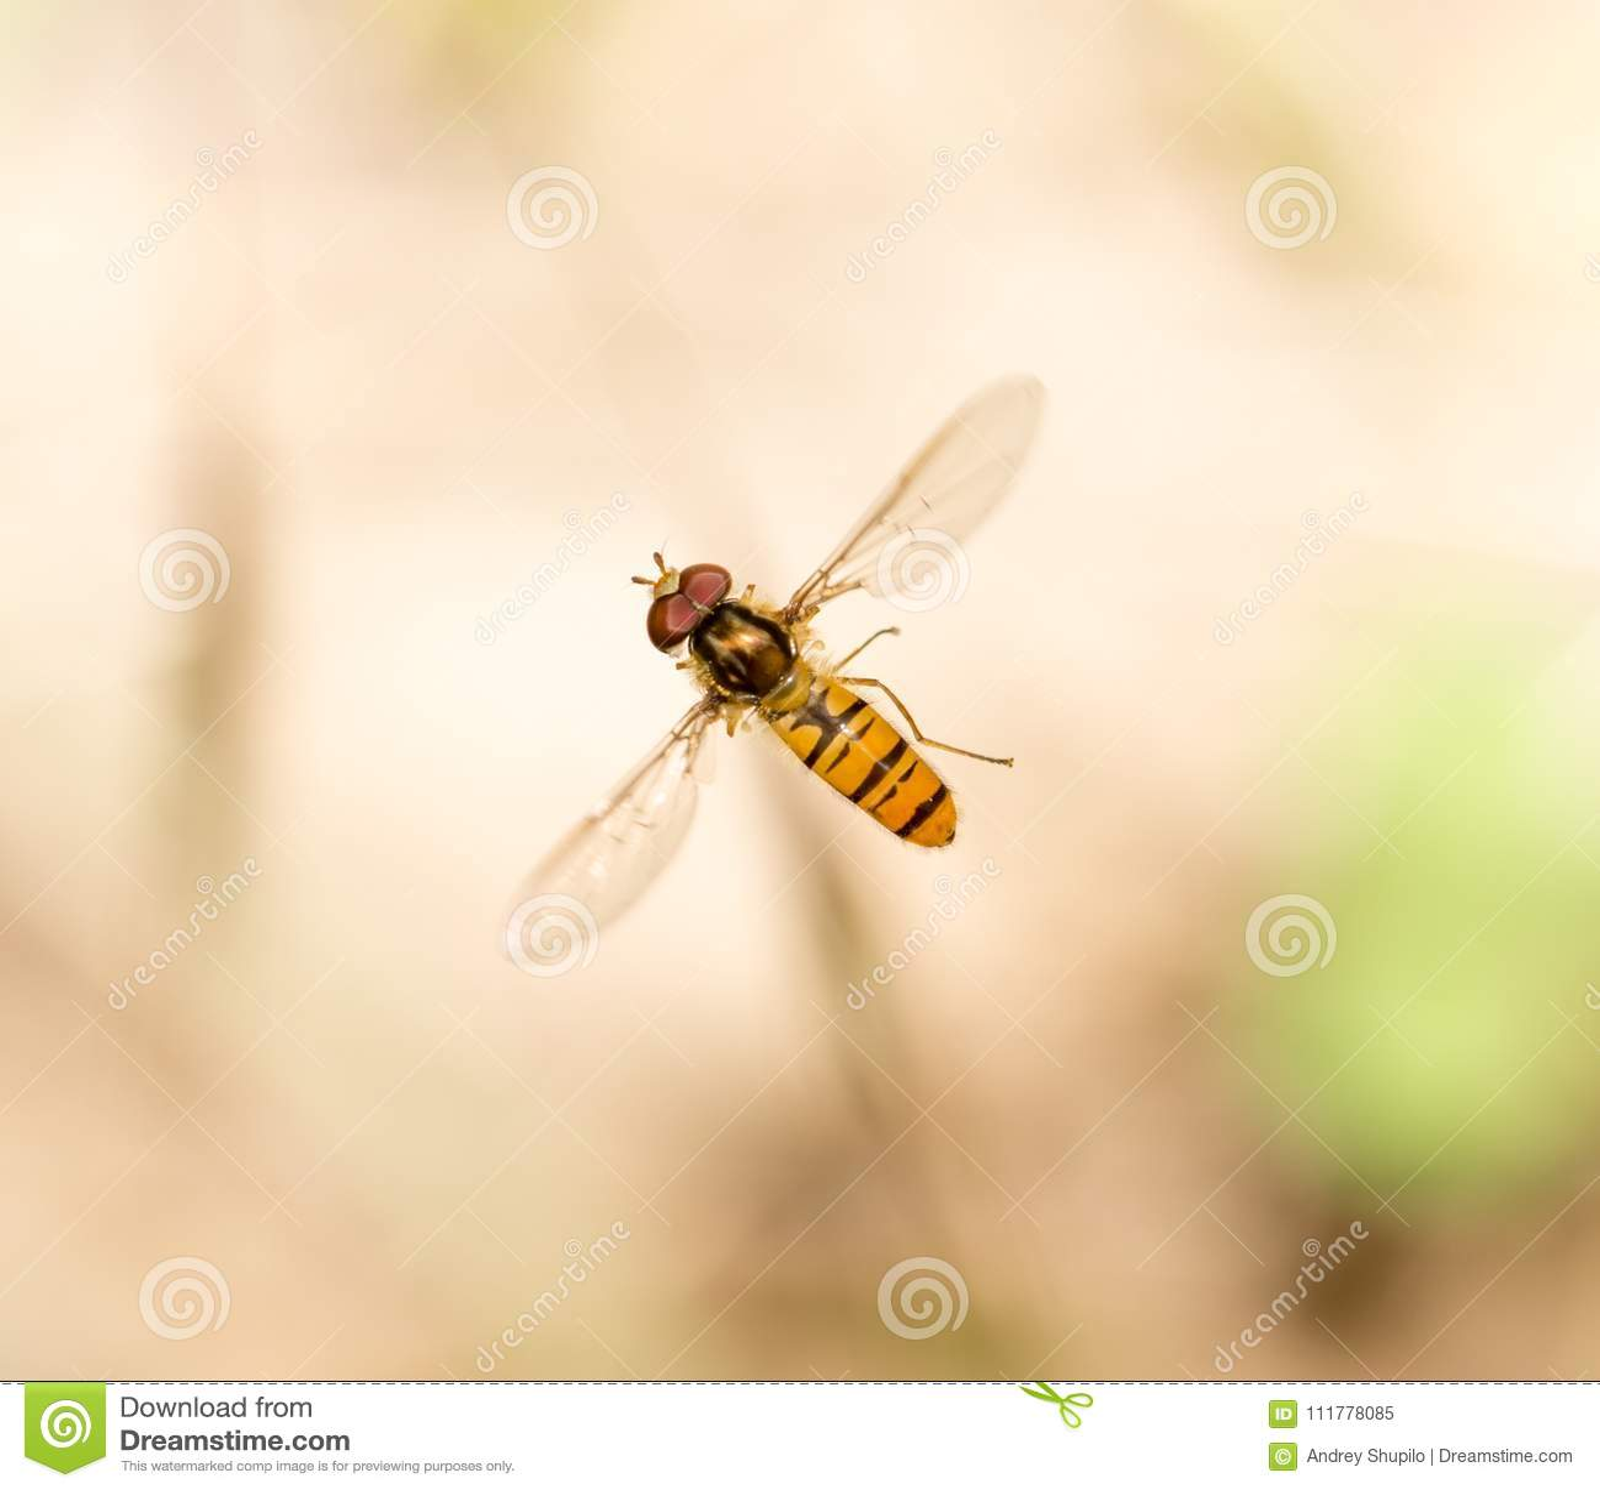 Fly in flight in nature. macro